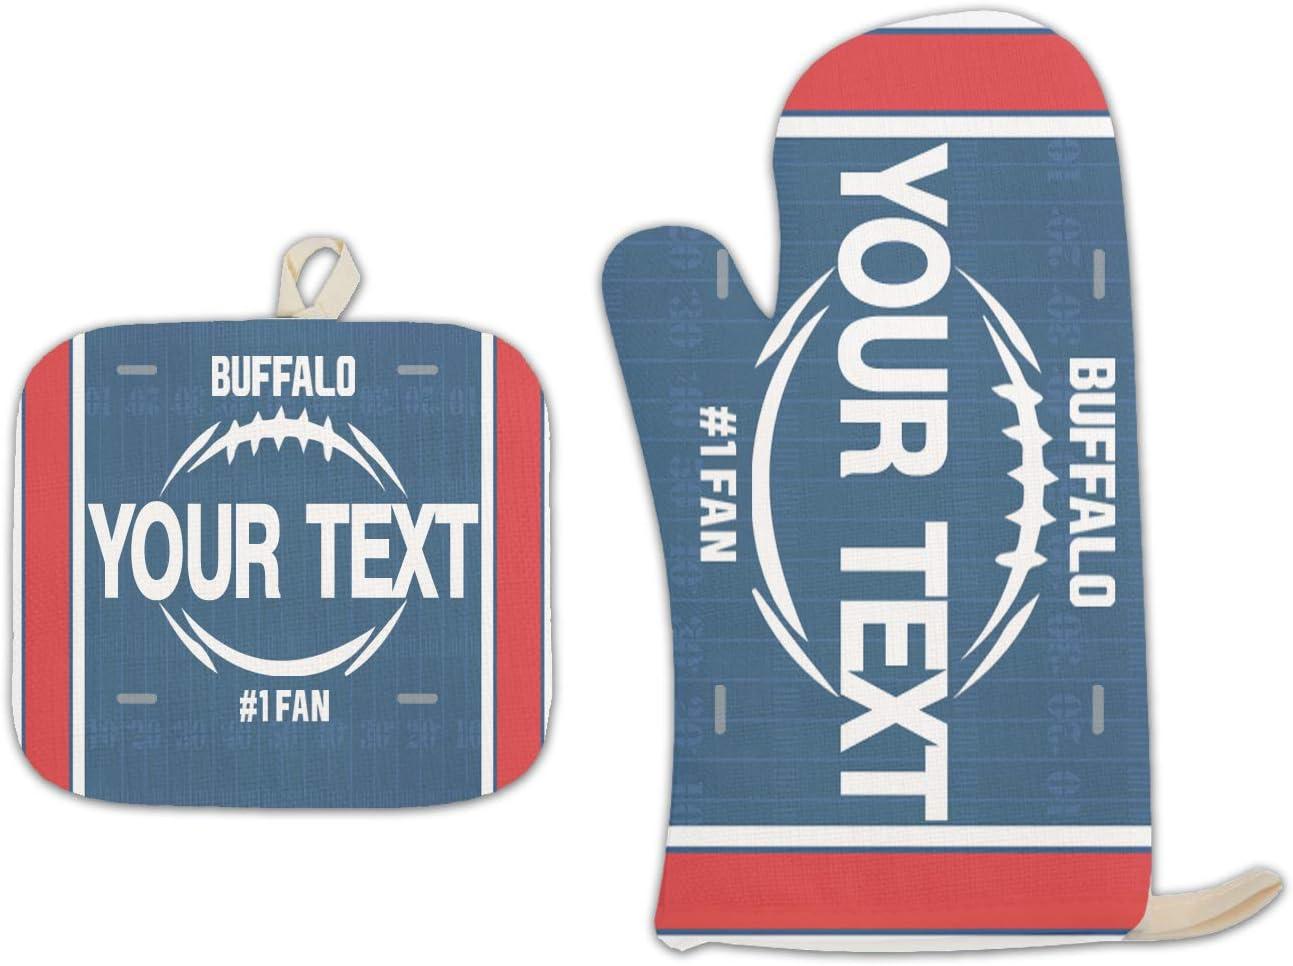 Bleu Reign BRGiftShop Personalized Custom Name Football Team Buffalo Linen Oven Mitt and Potholder Set